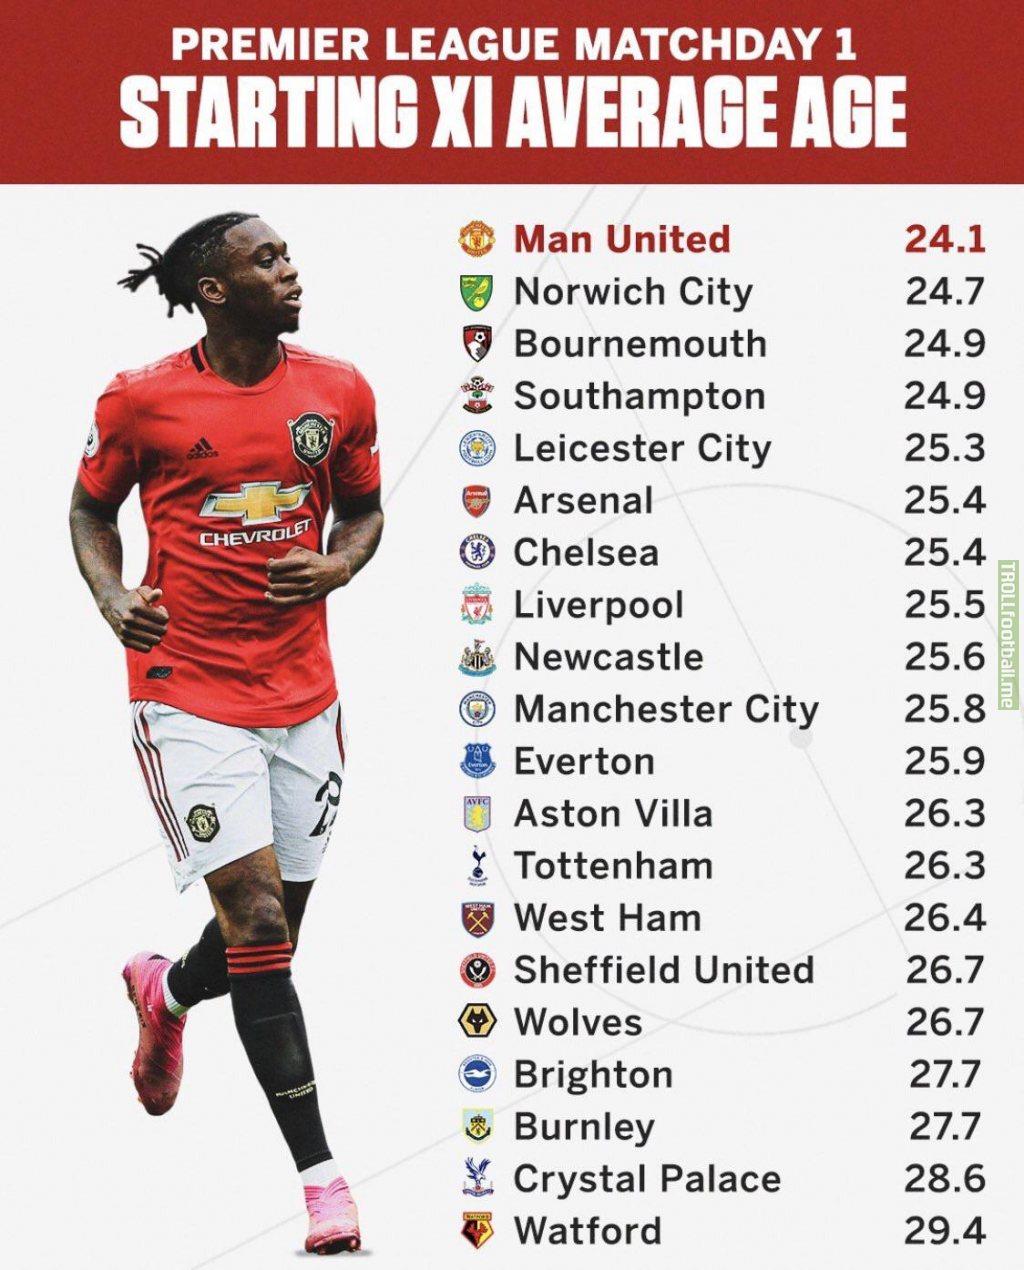 PL Matchday 1 Starting XI Average Age